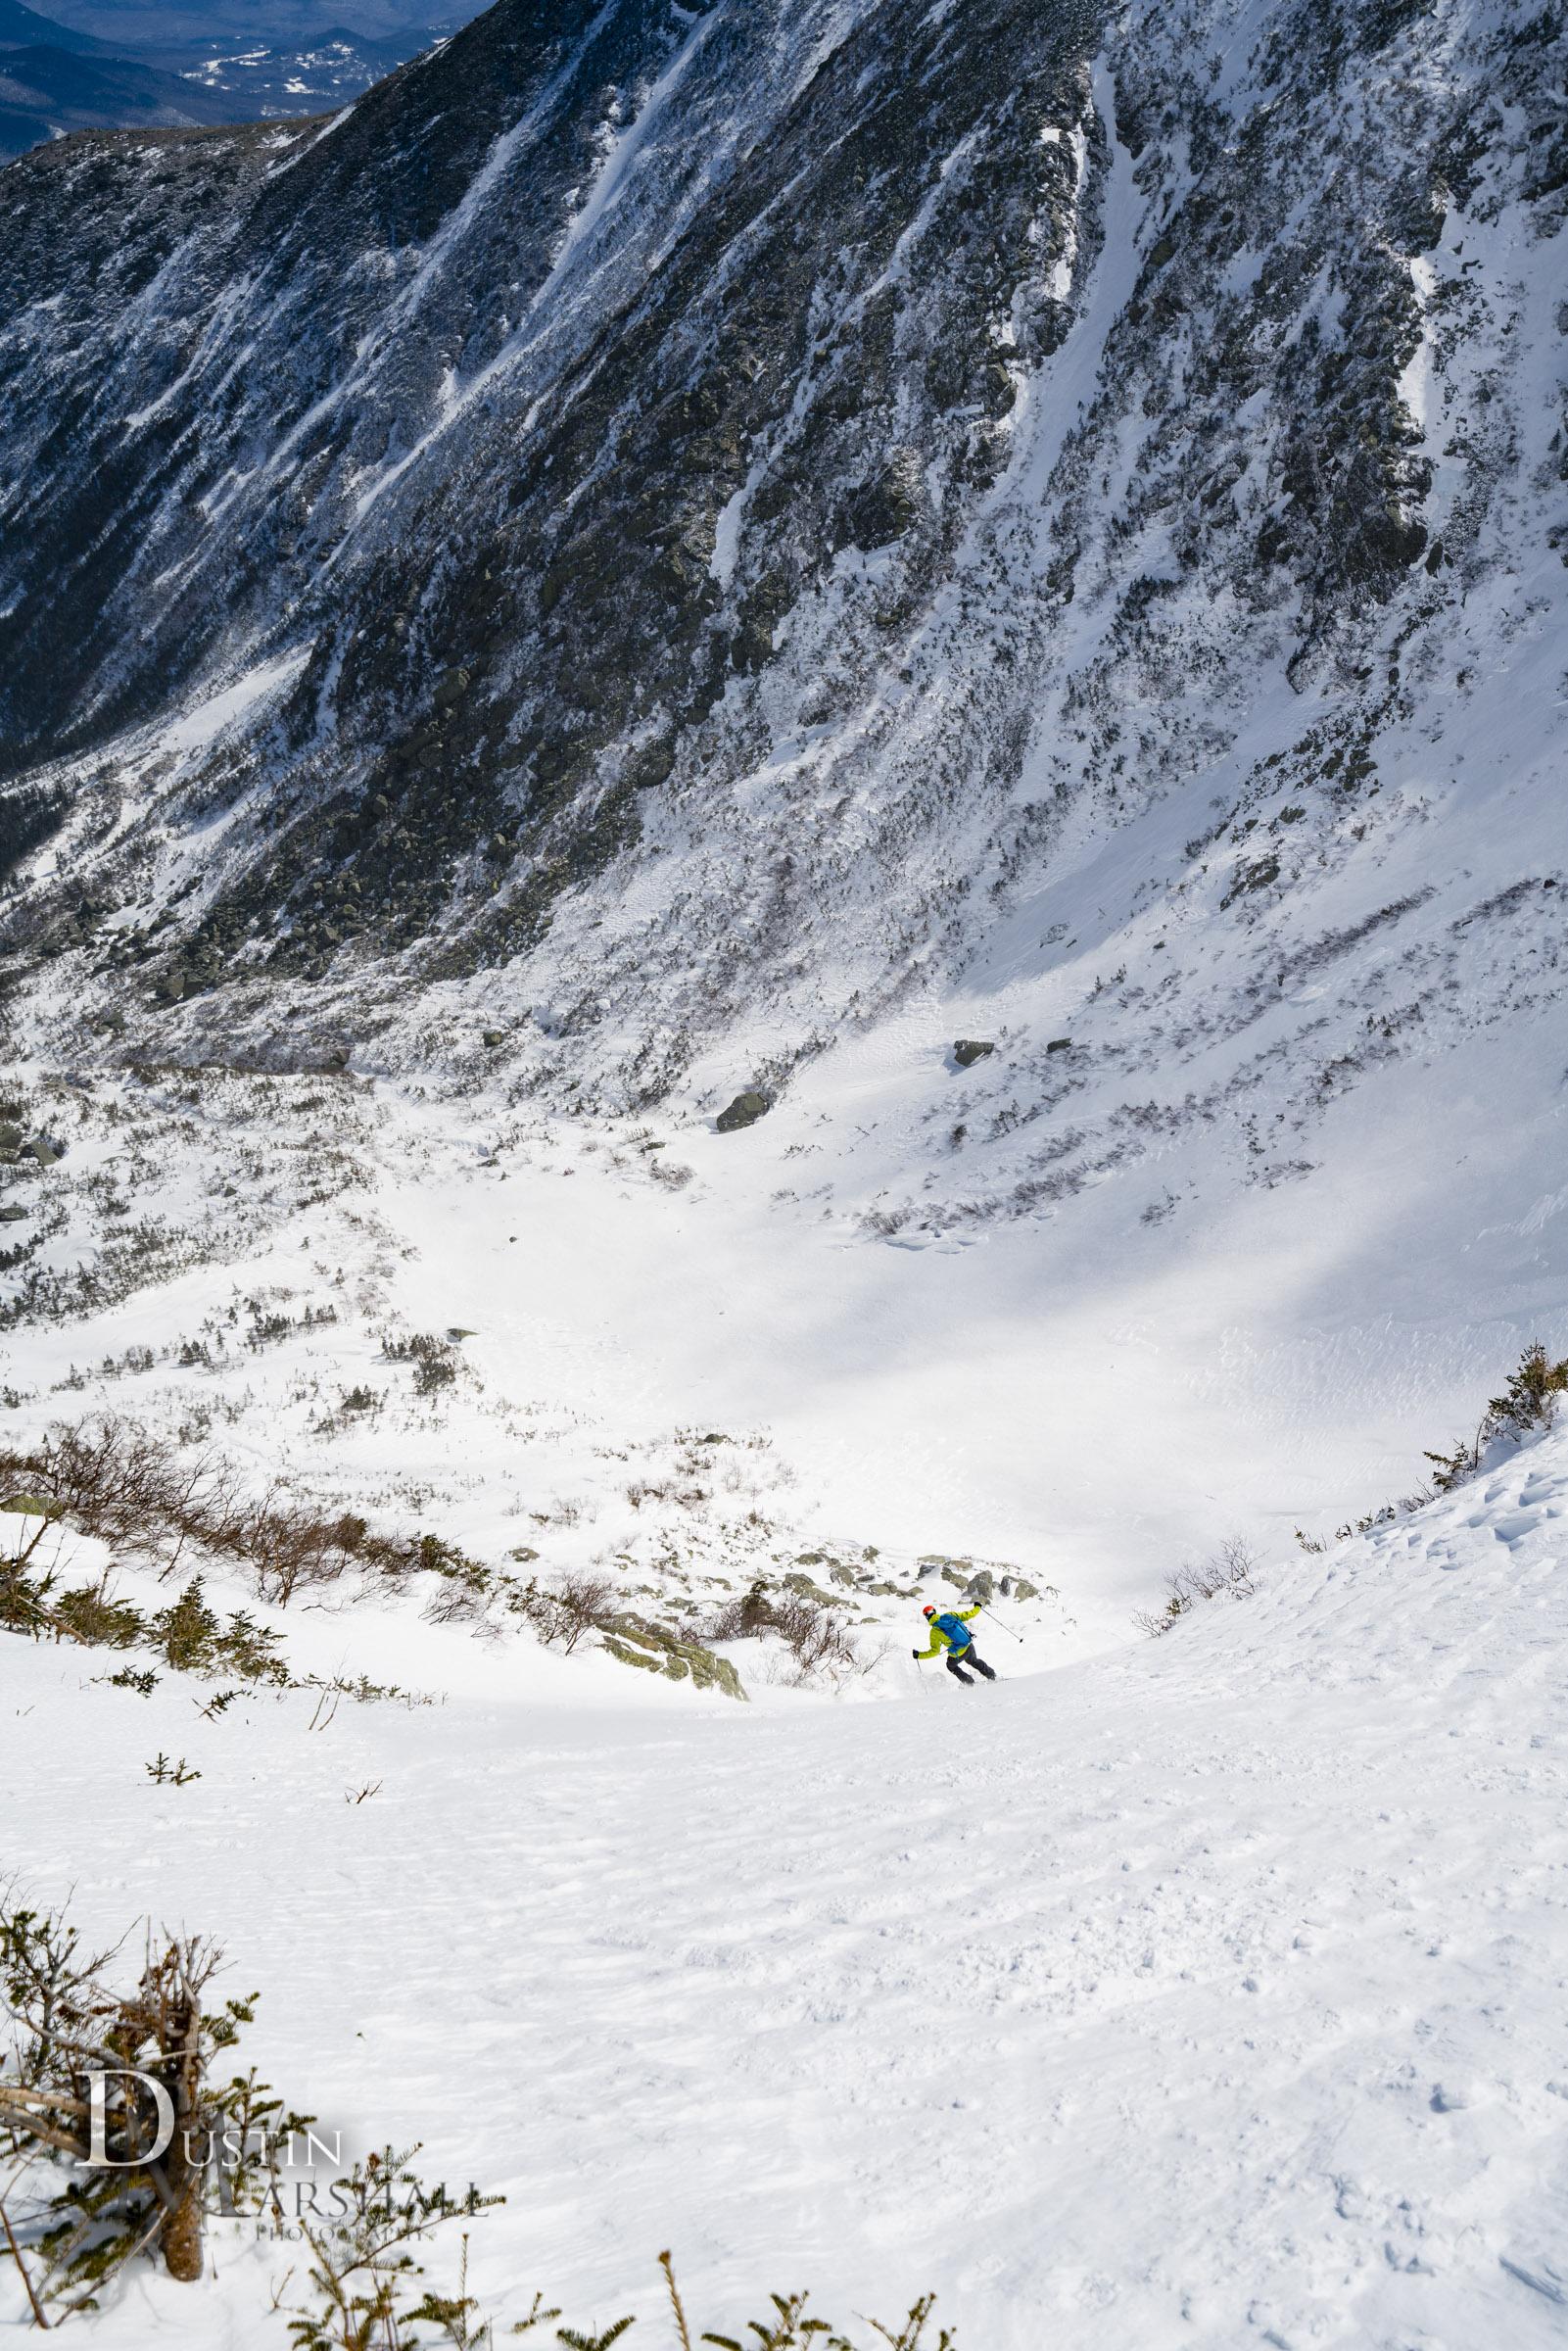 Ever feel small? Tuckerman Ravine skiing